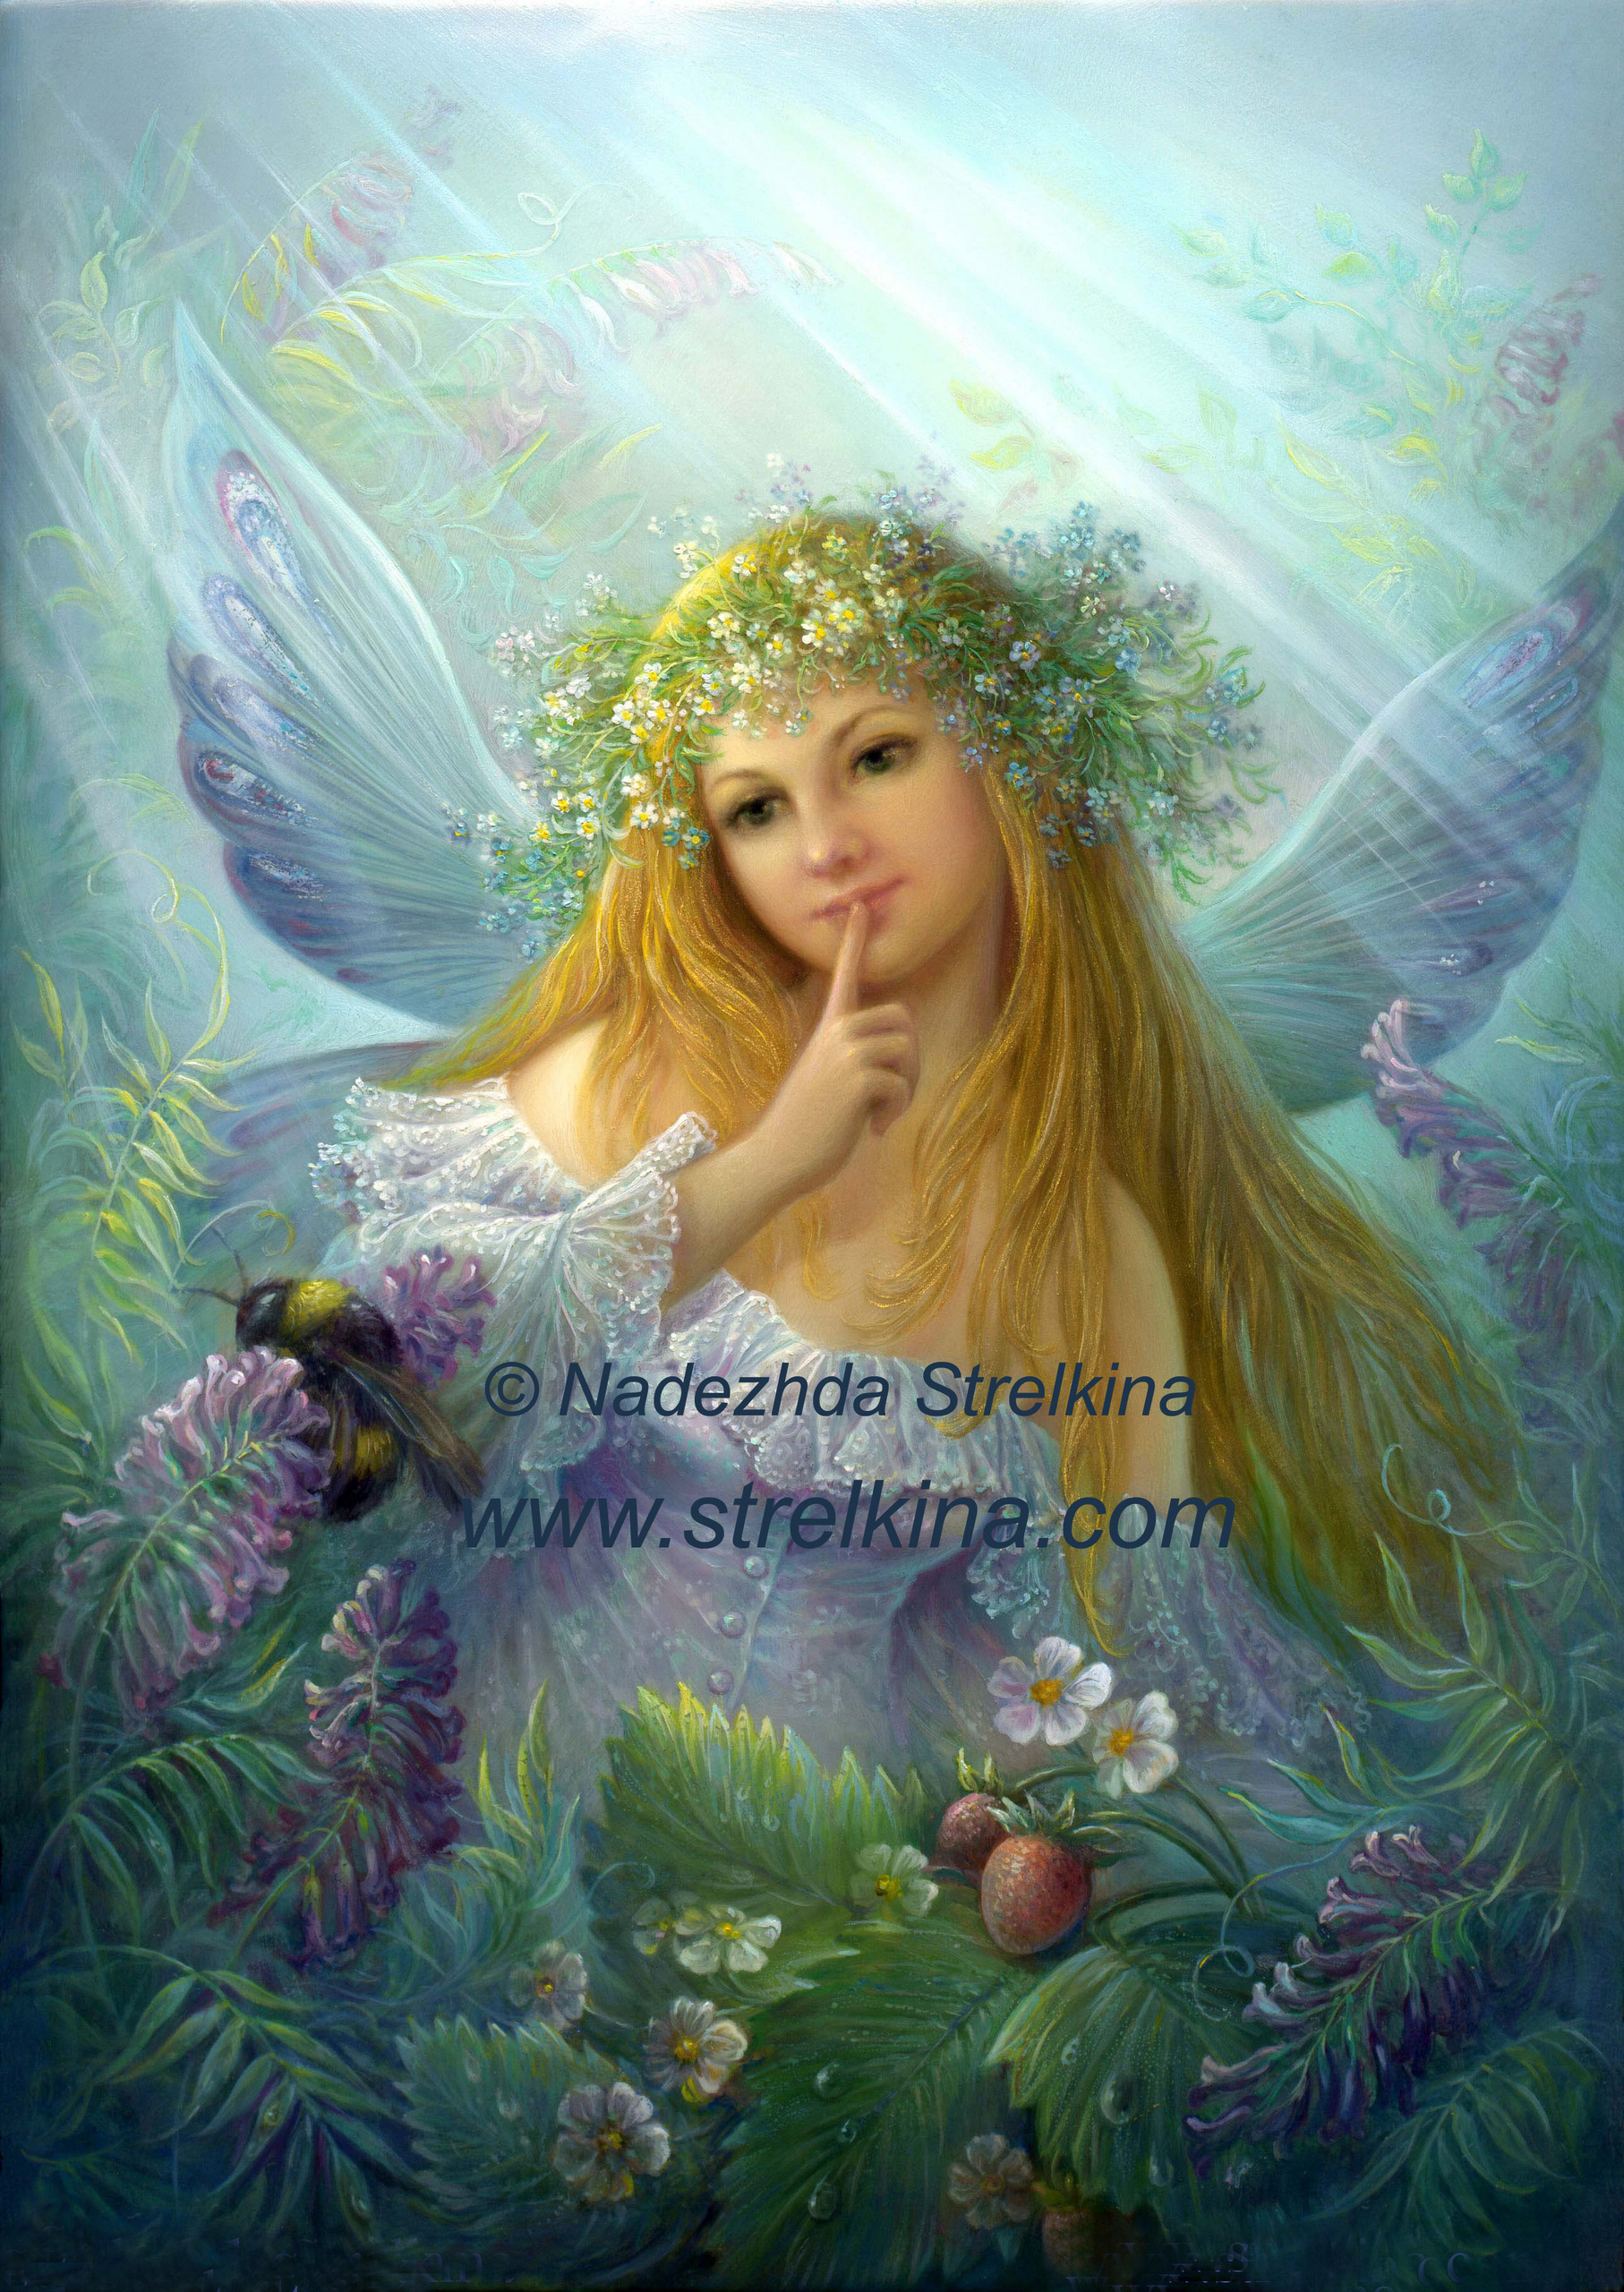 Forest Fairy Fantasy Art Photo 8512409 Fanpop